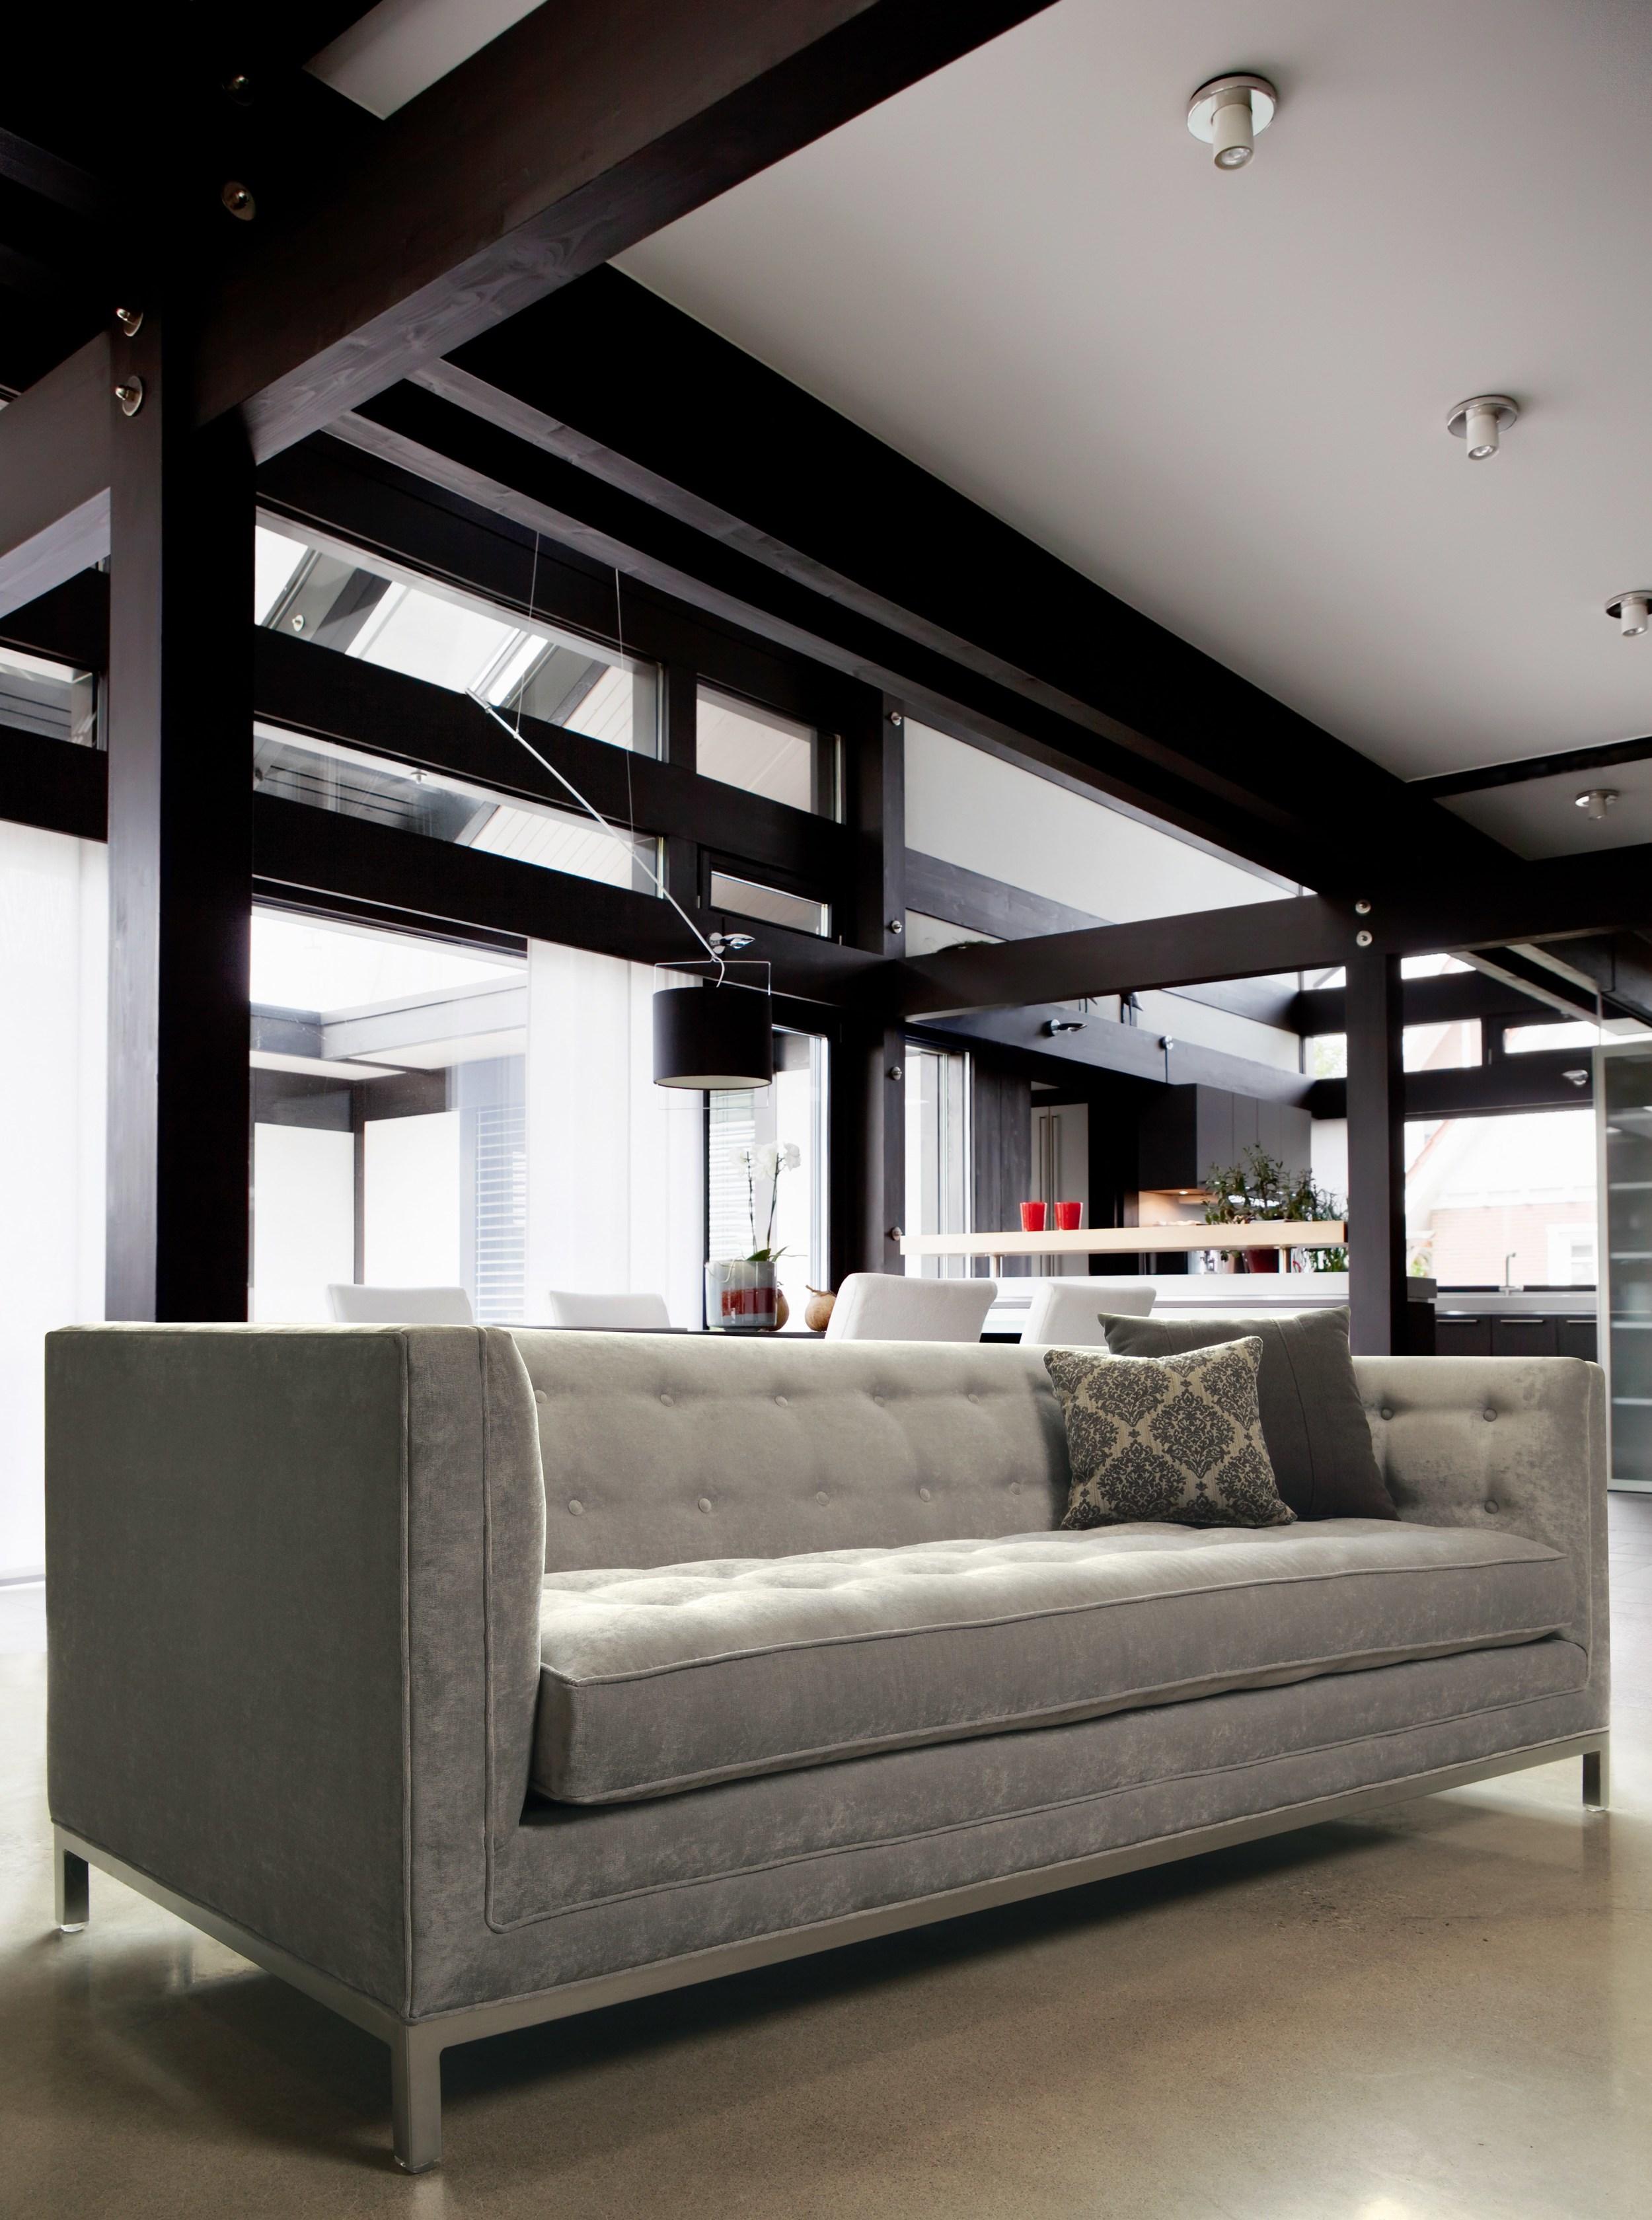 Sofa in Roomset.jpg